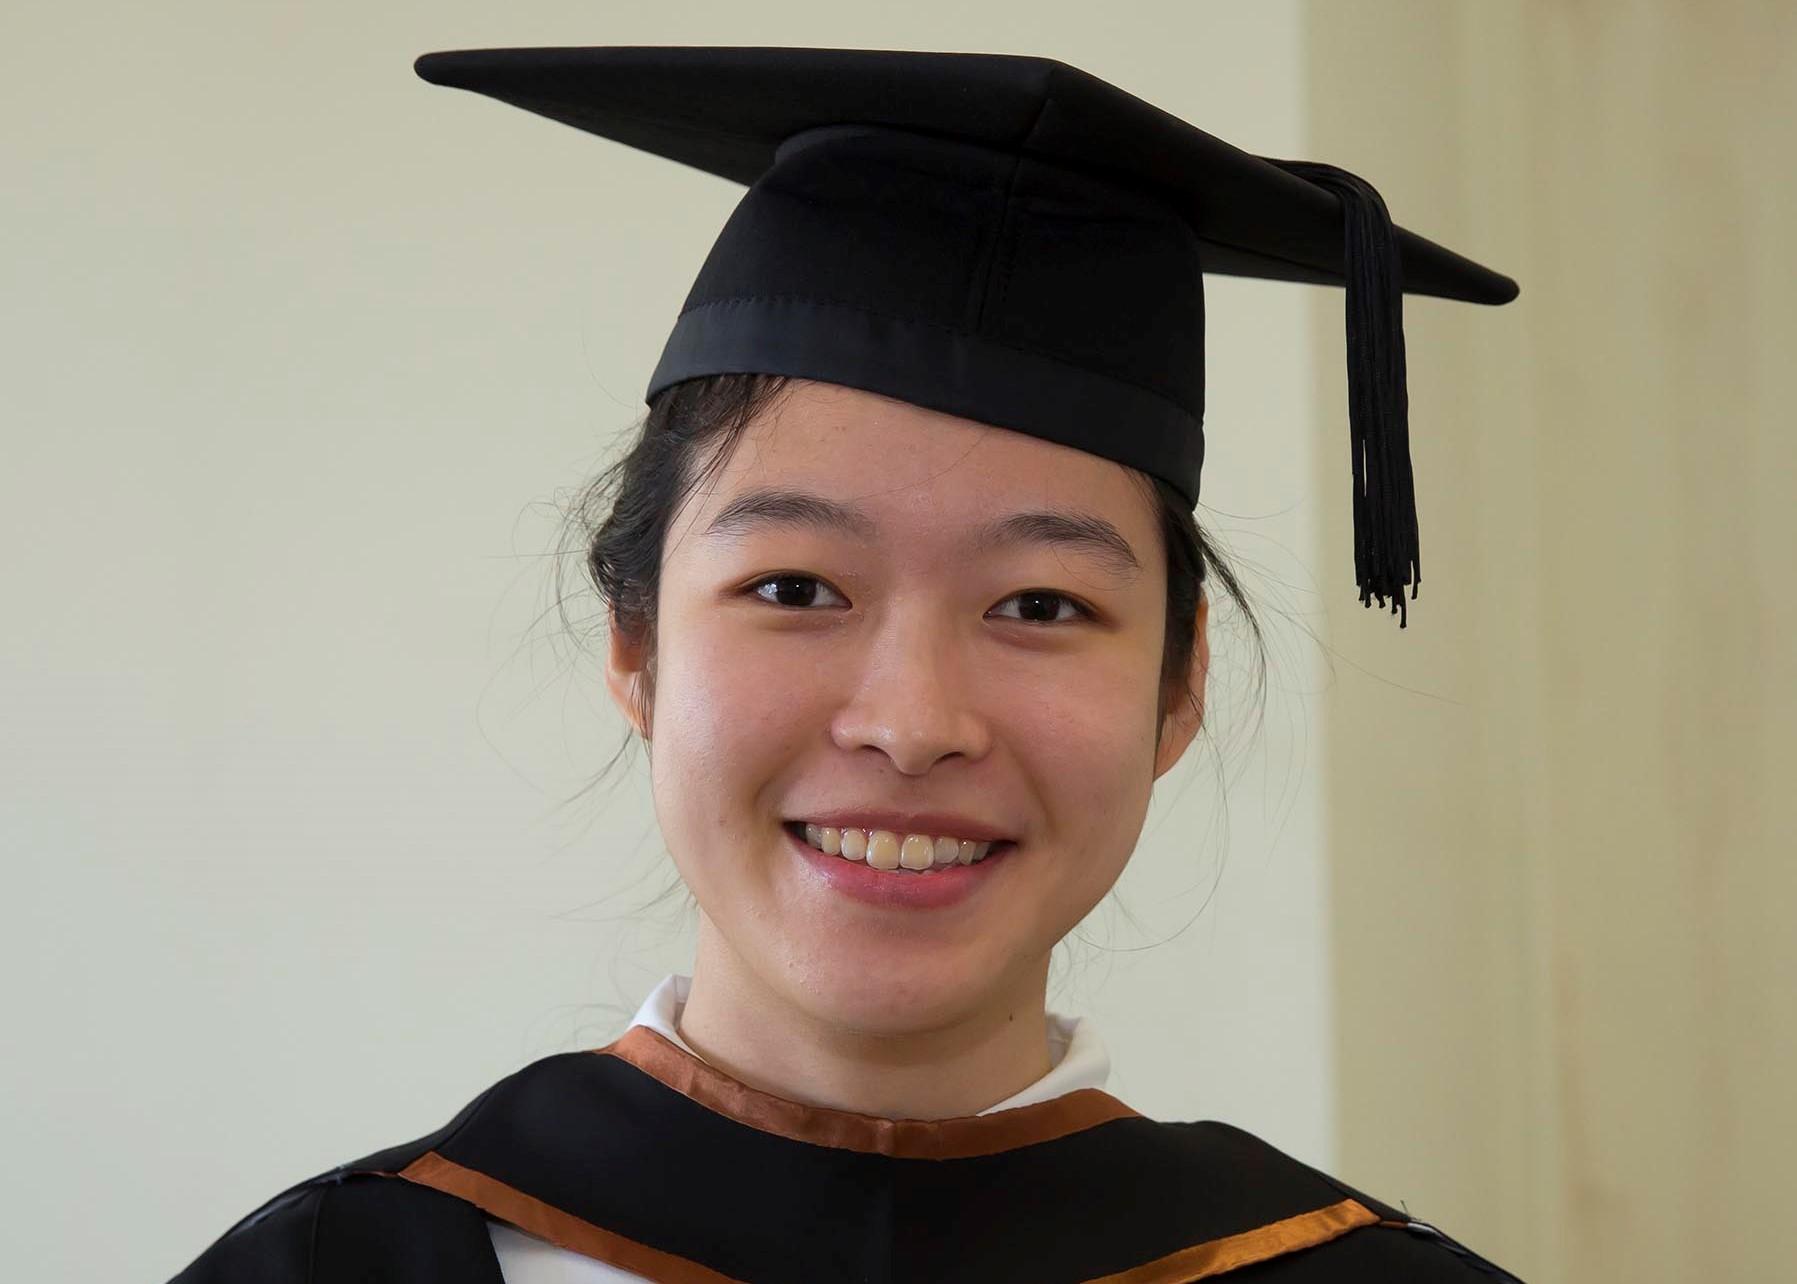 Yi Hui Tan - Bachelor of Science (Honours) in Quantity Surveying